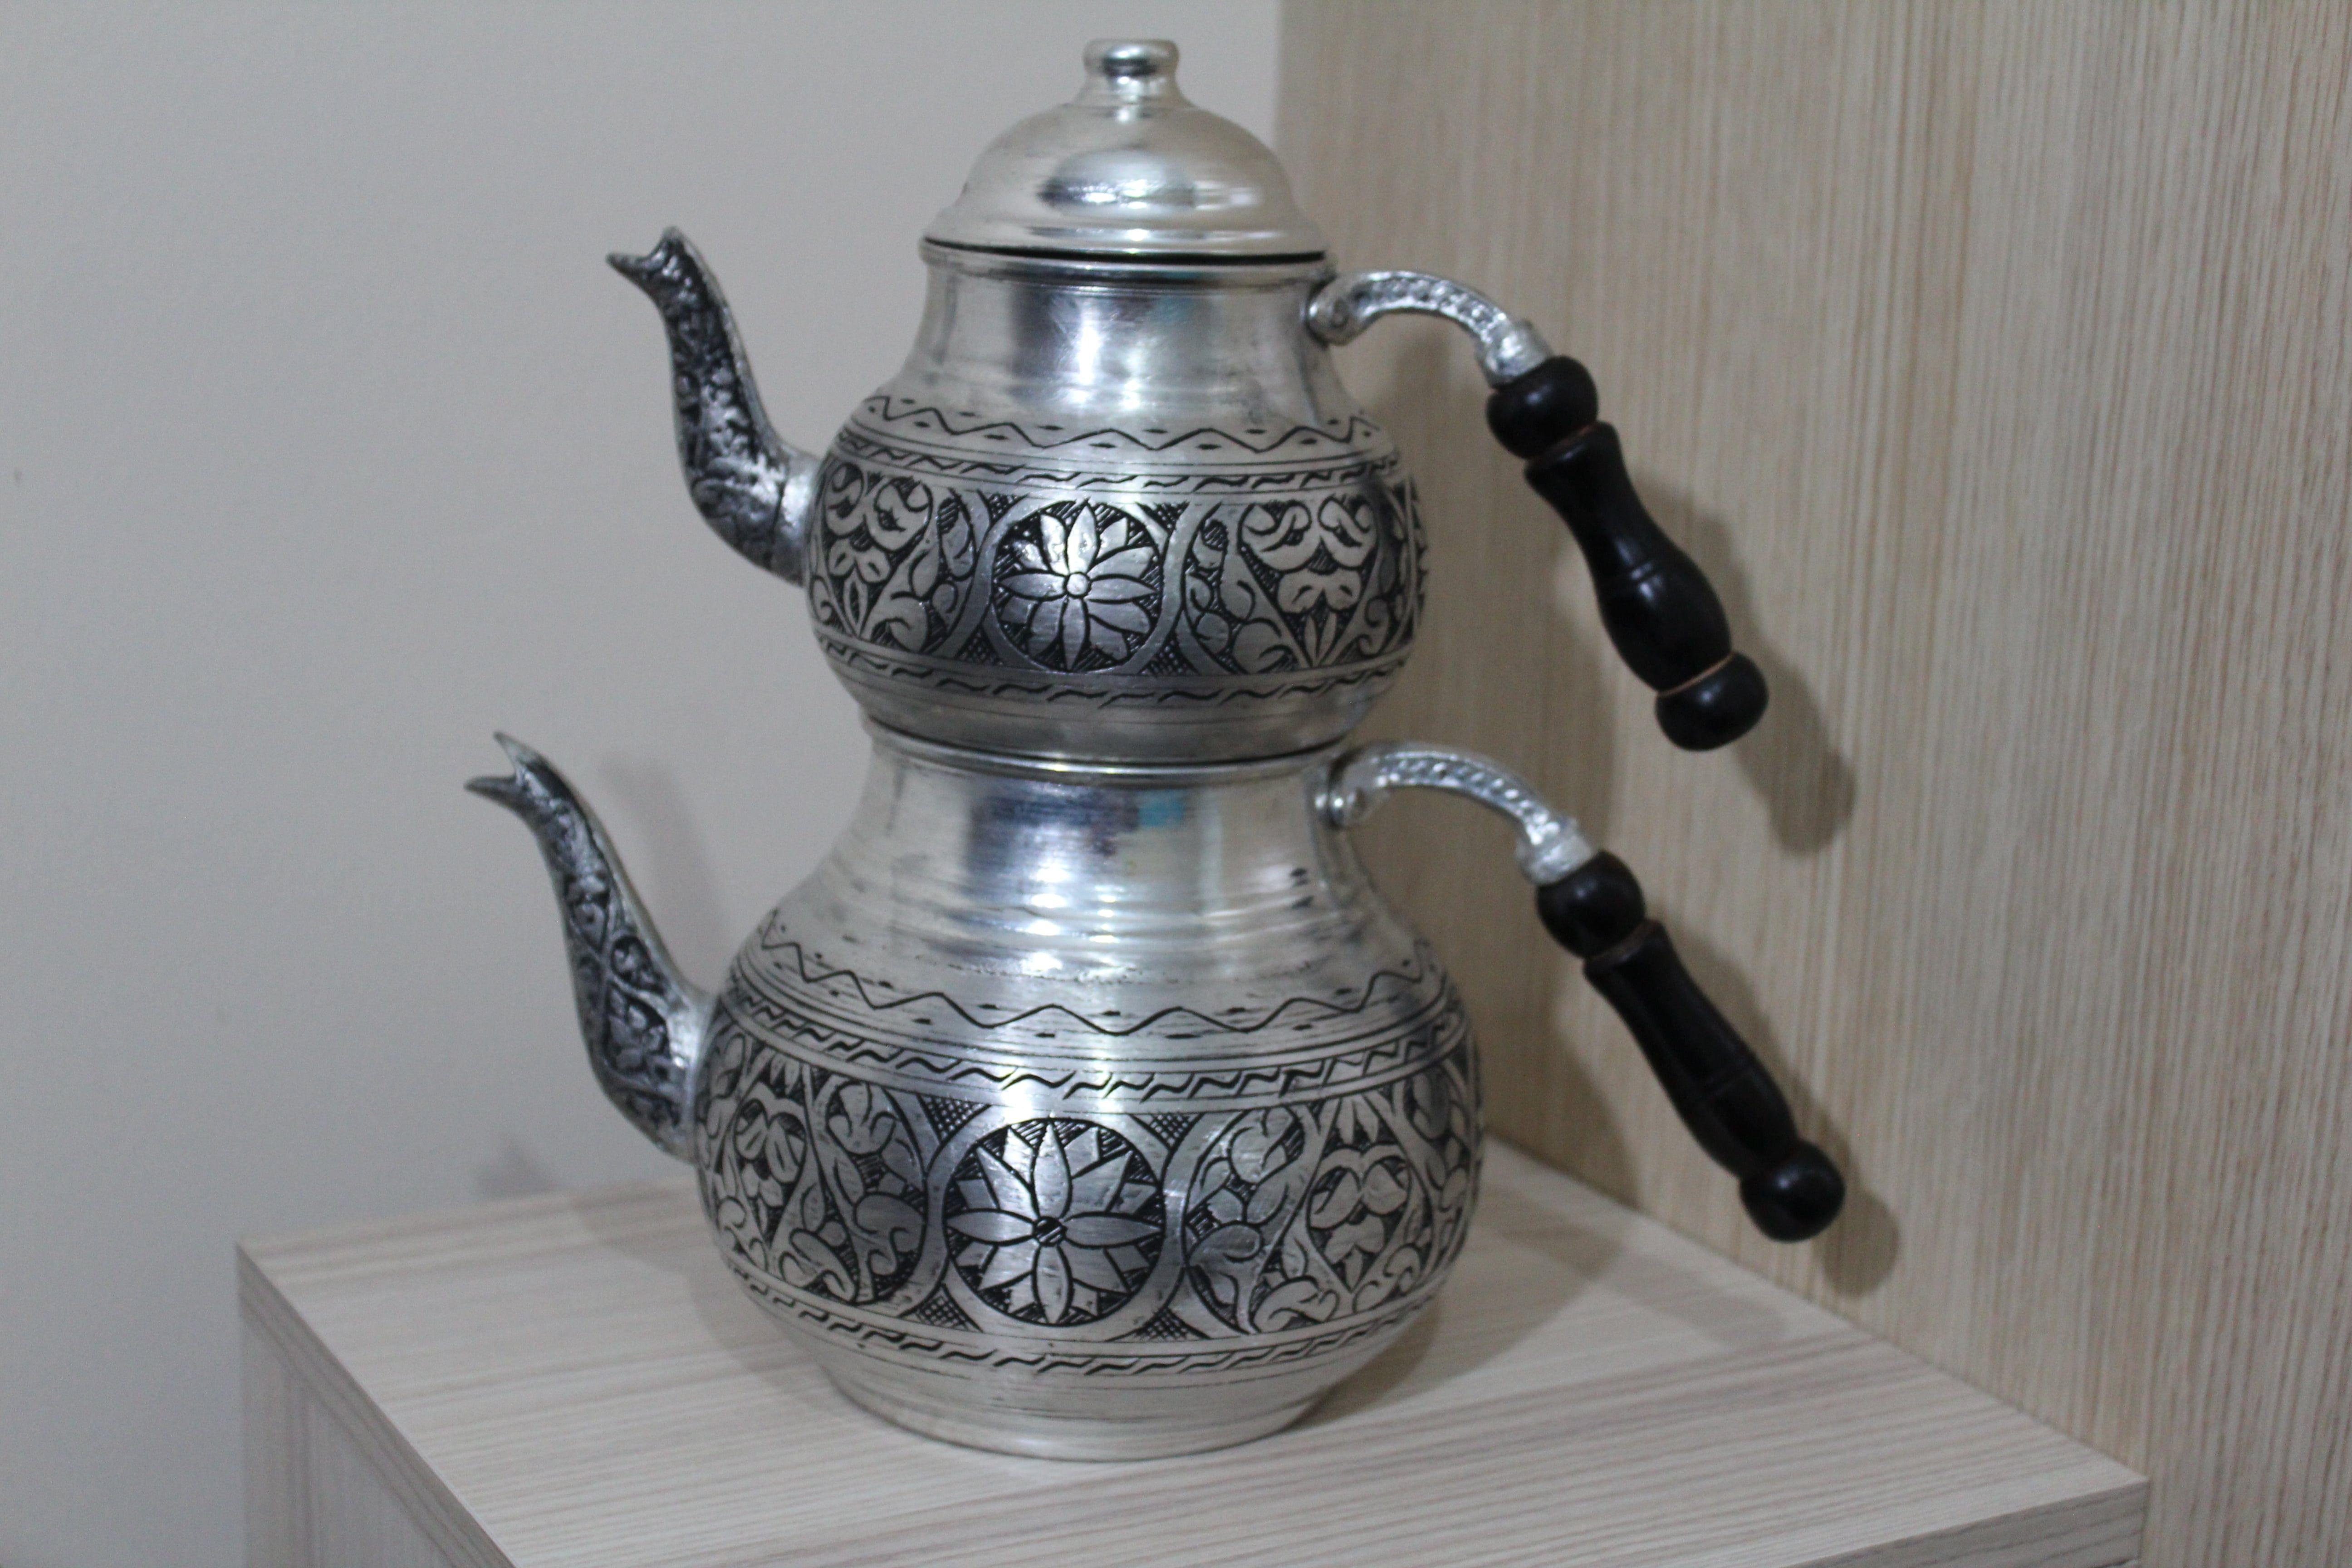 Copper tea kettle teapot pitcher pepper grinder